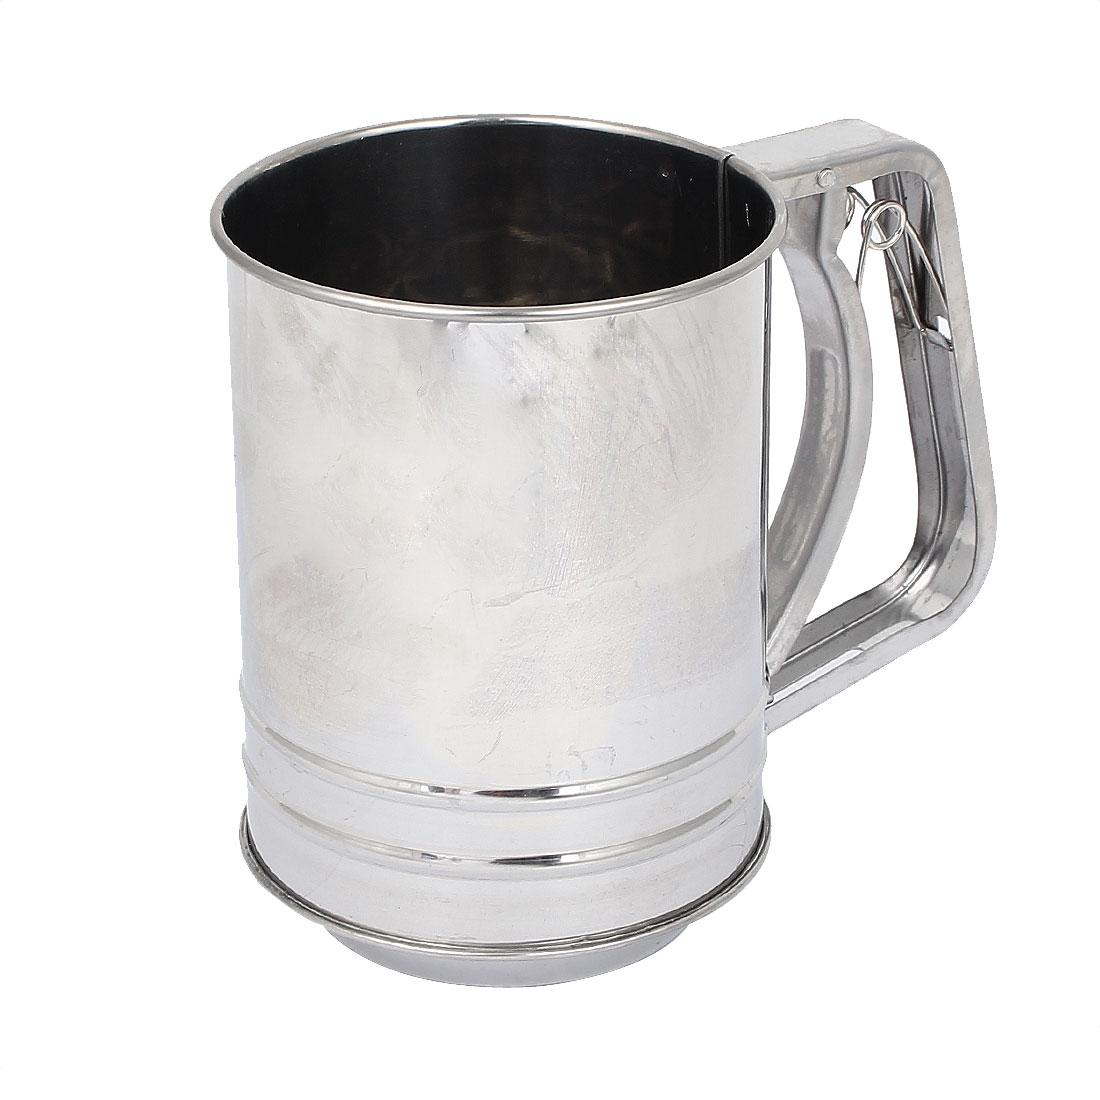 Kitchen Baking Stainless Steel Trigger Handle Flour Sugar Mesh Sifter Shaker 550ml